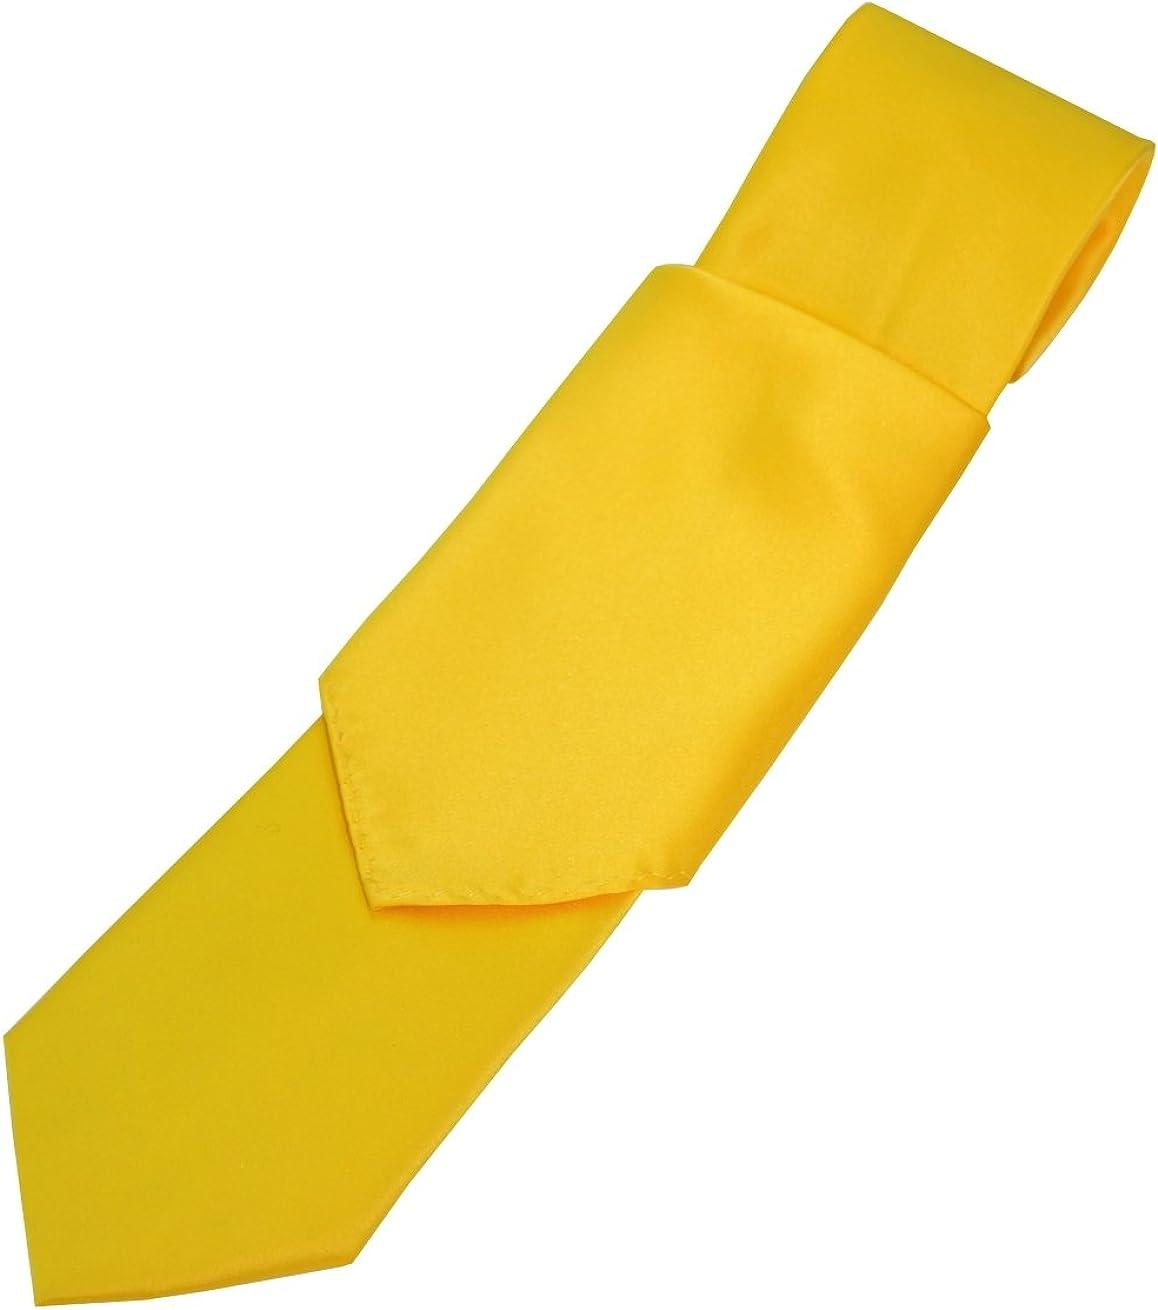 Solid Satin Men's Necktie and Pocket Square set in Gold